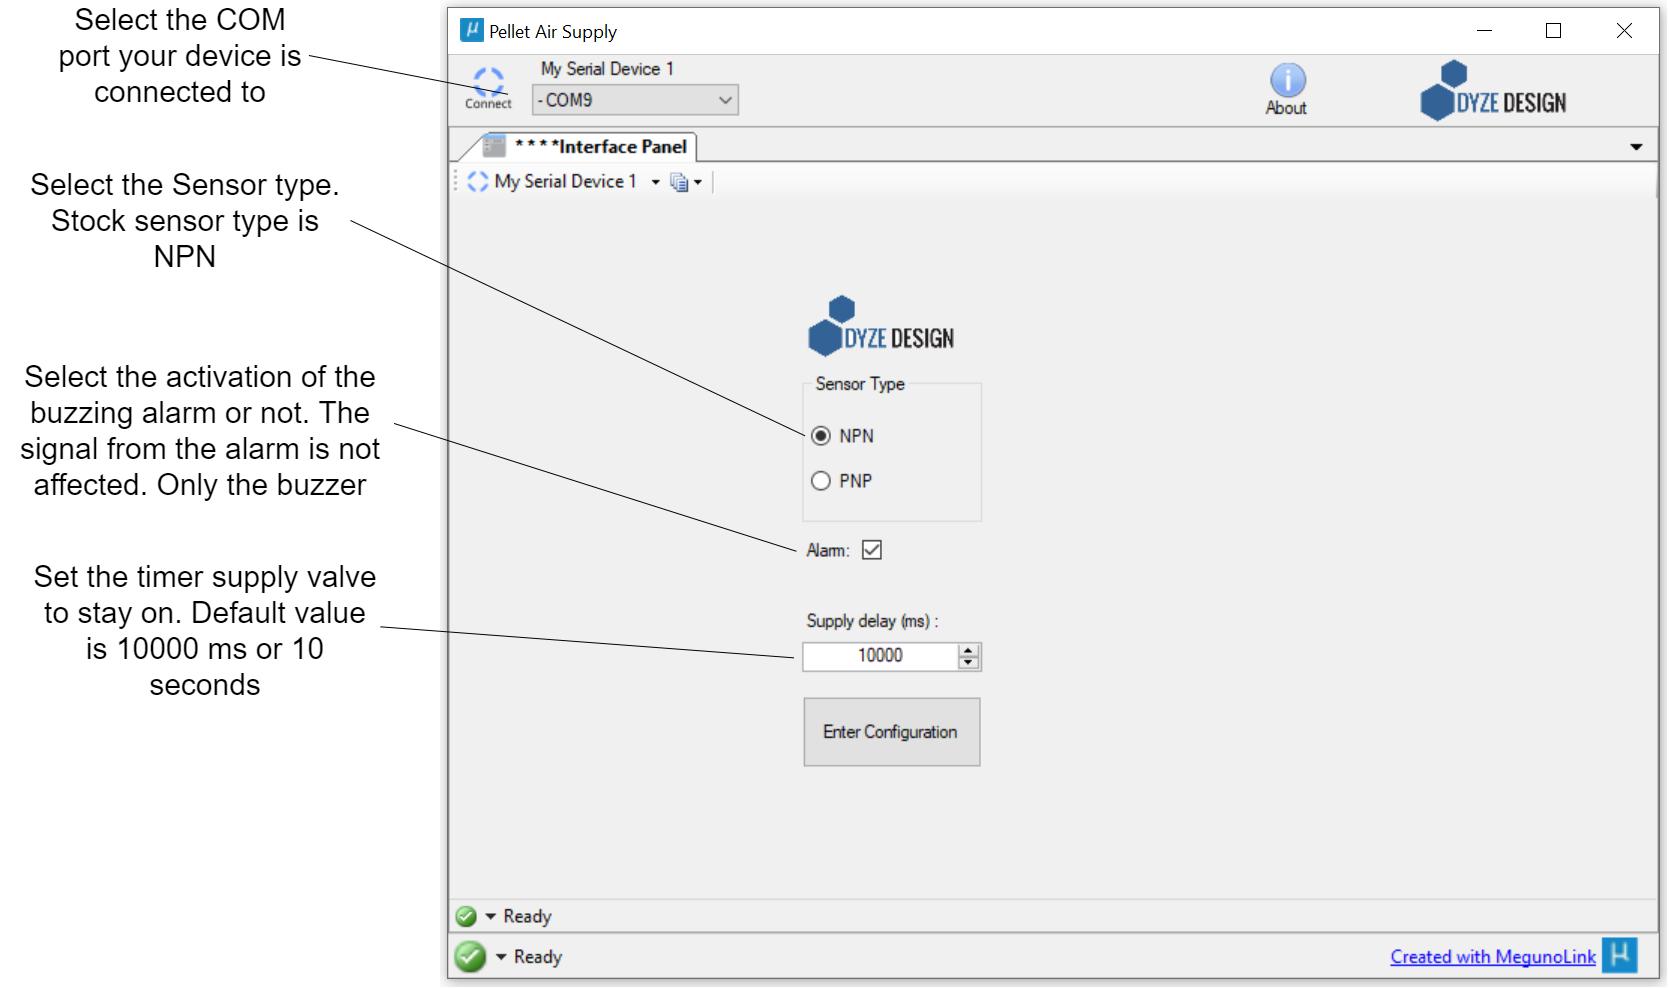 Configuration inputs